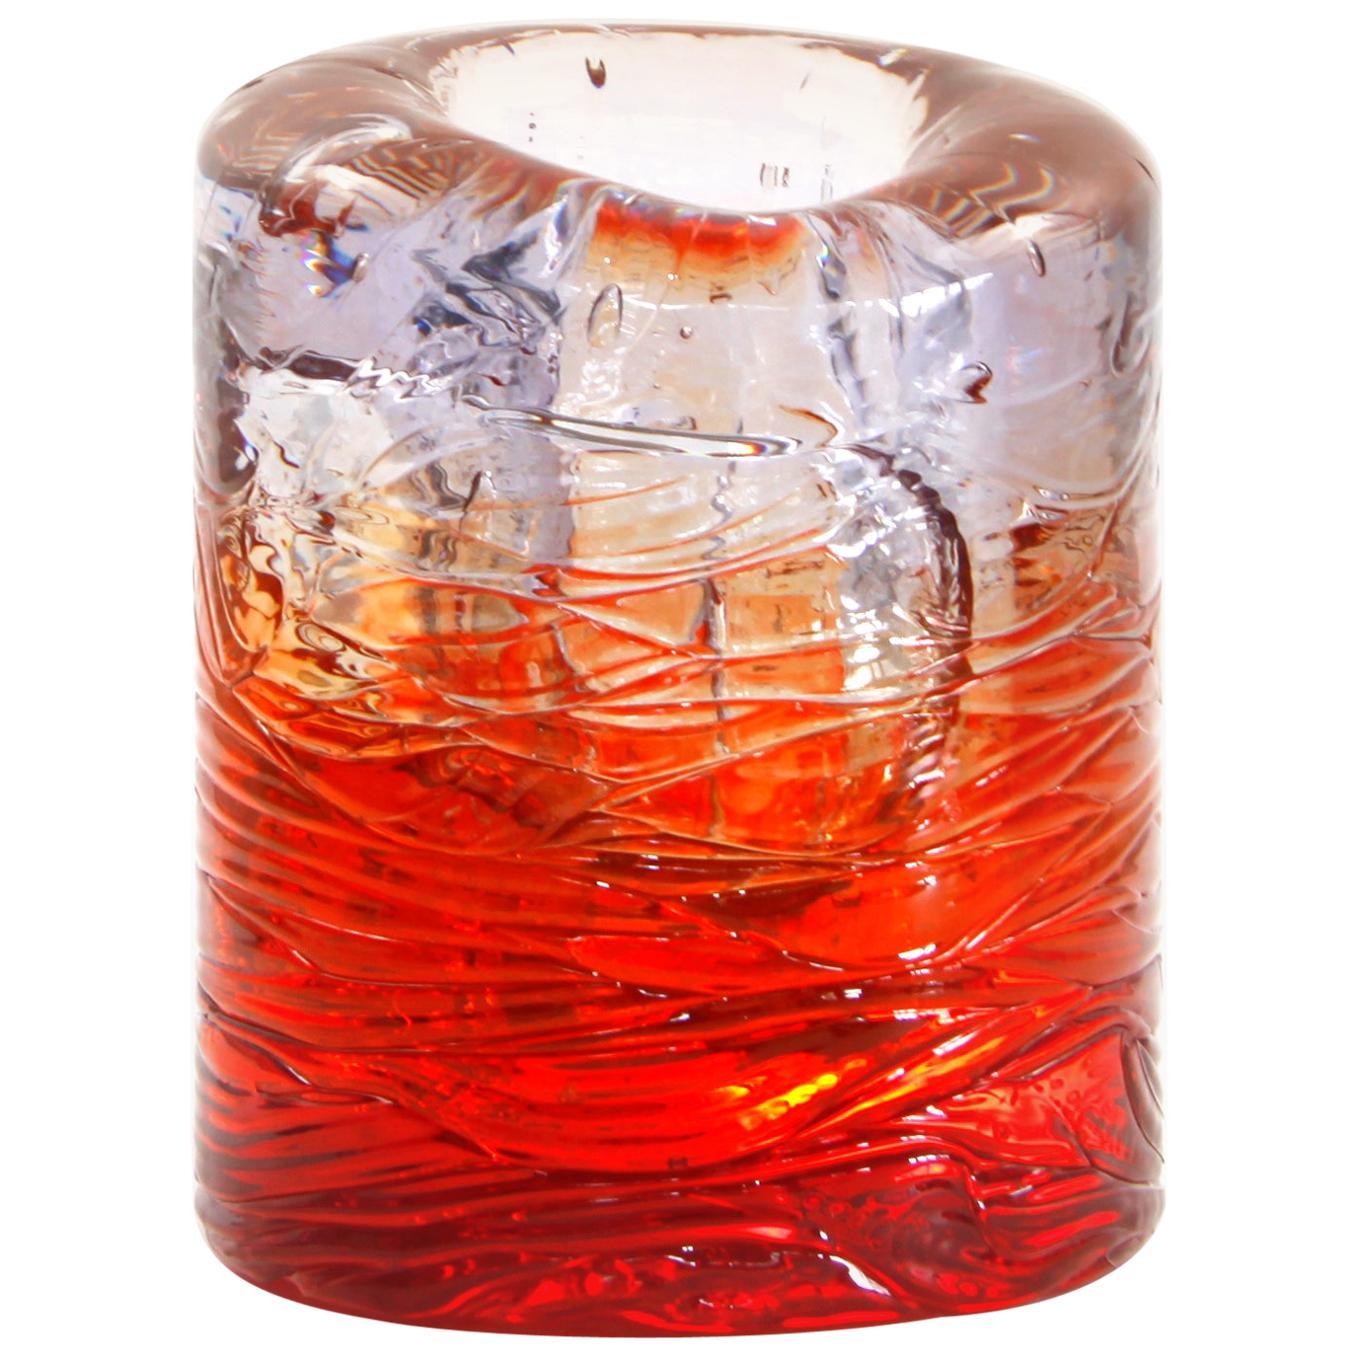 Jungle Contemporary Vase, Small Bicolor Transparent and Red by Jacopo Foggini